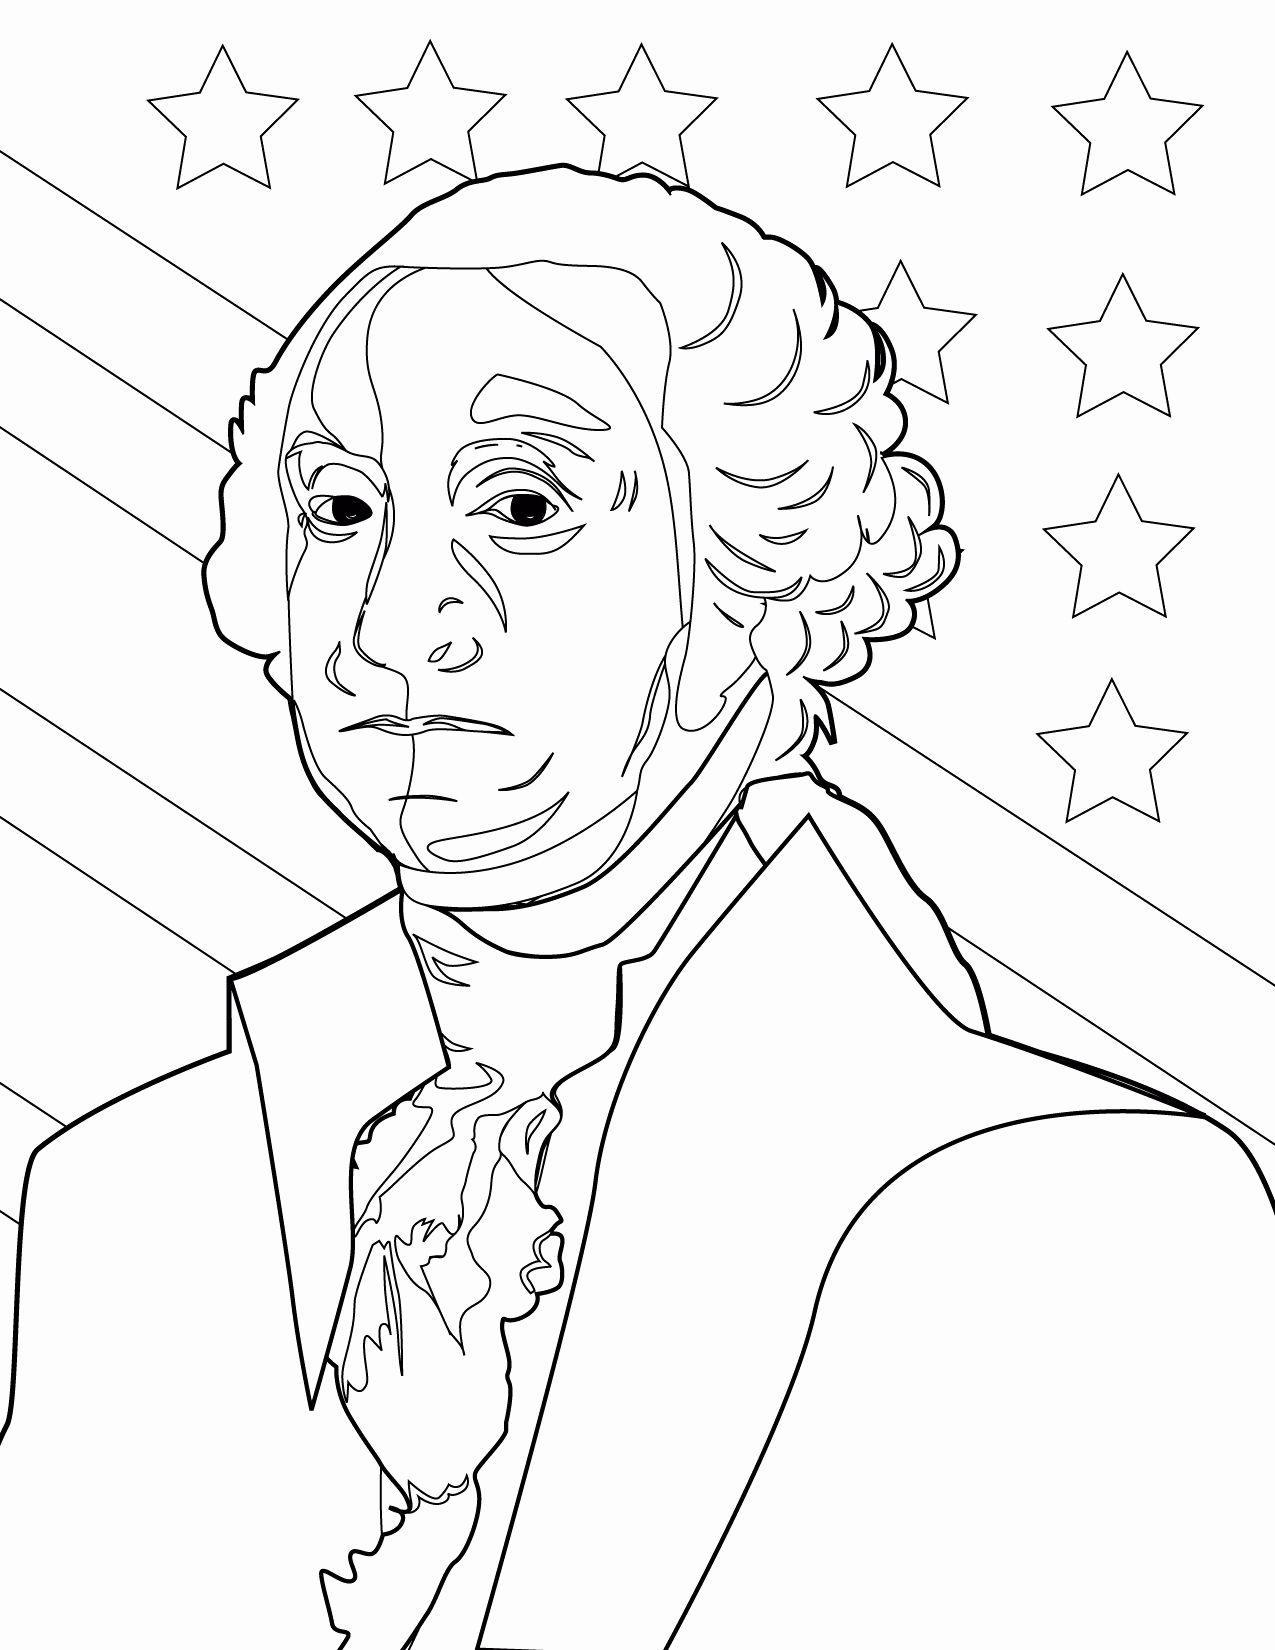 George Washington Coloring Page Unique George Washington